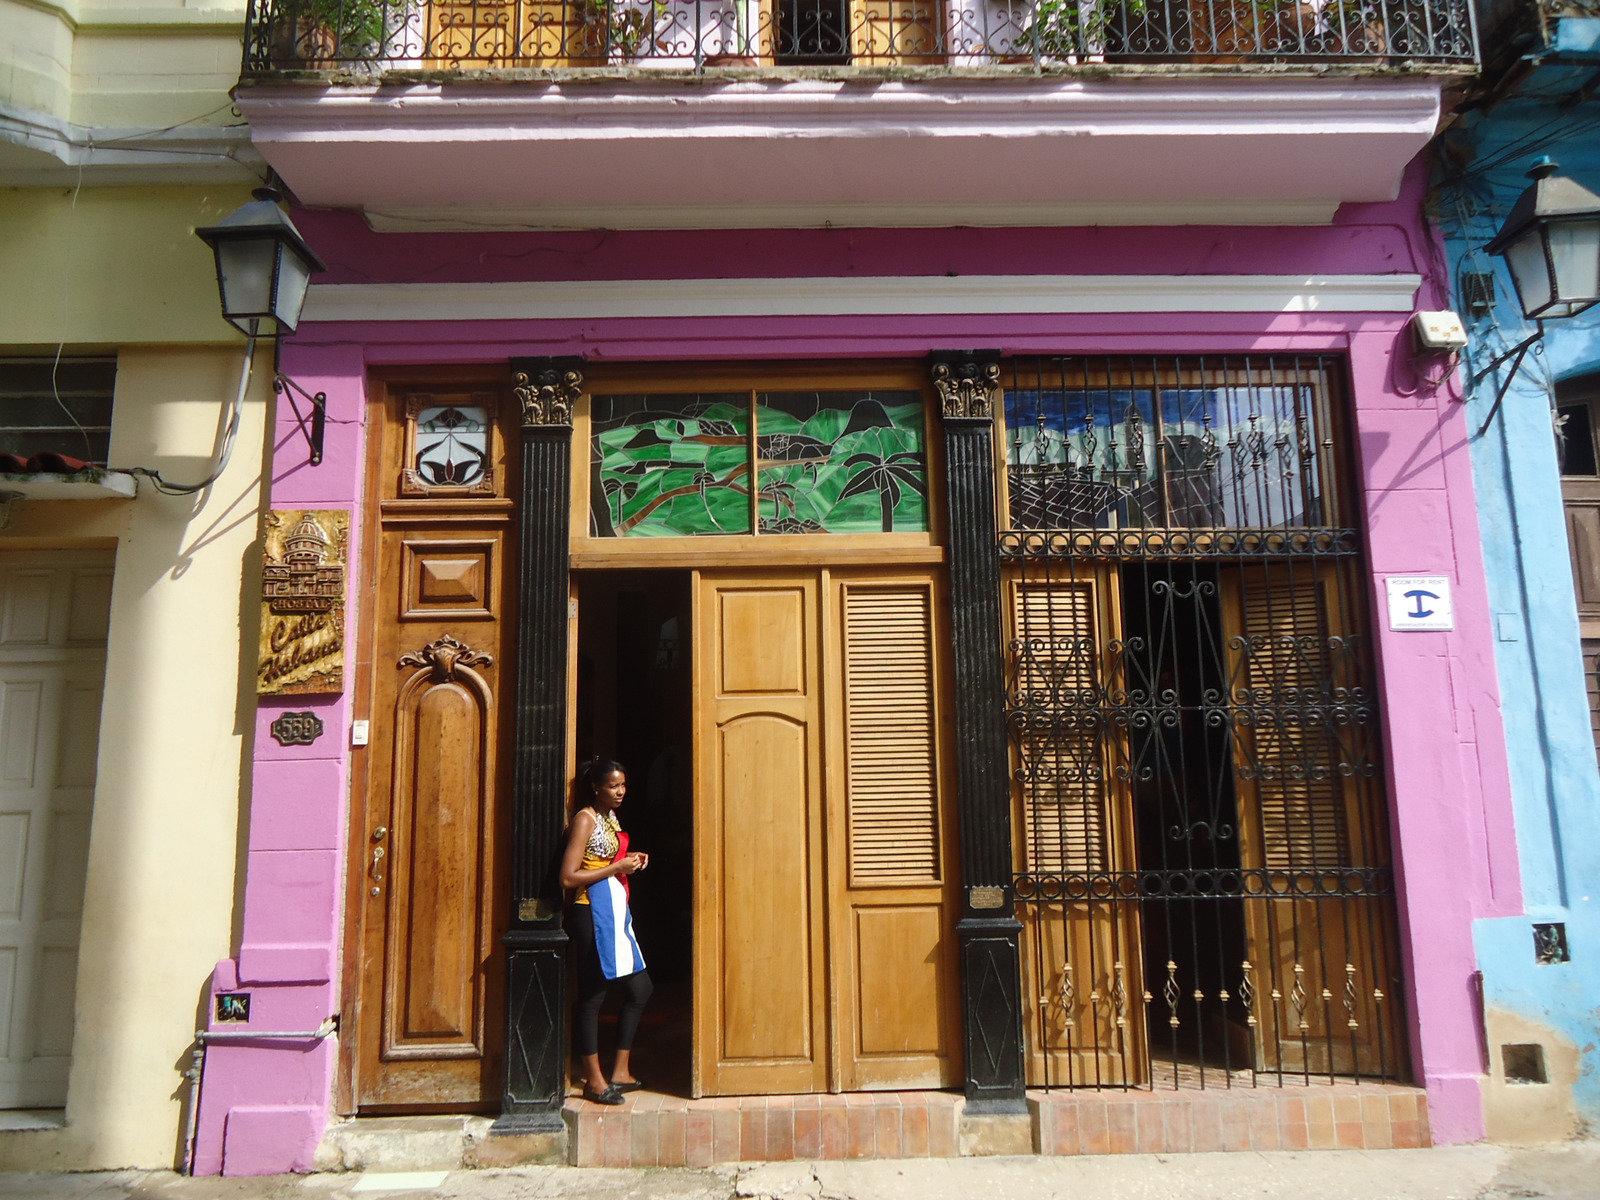 stal Calle Habana